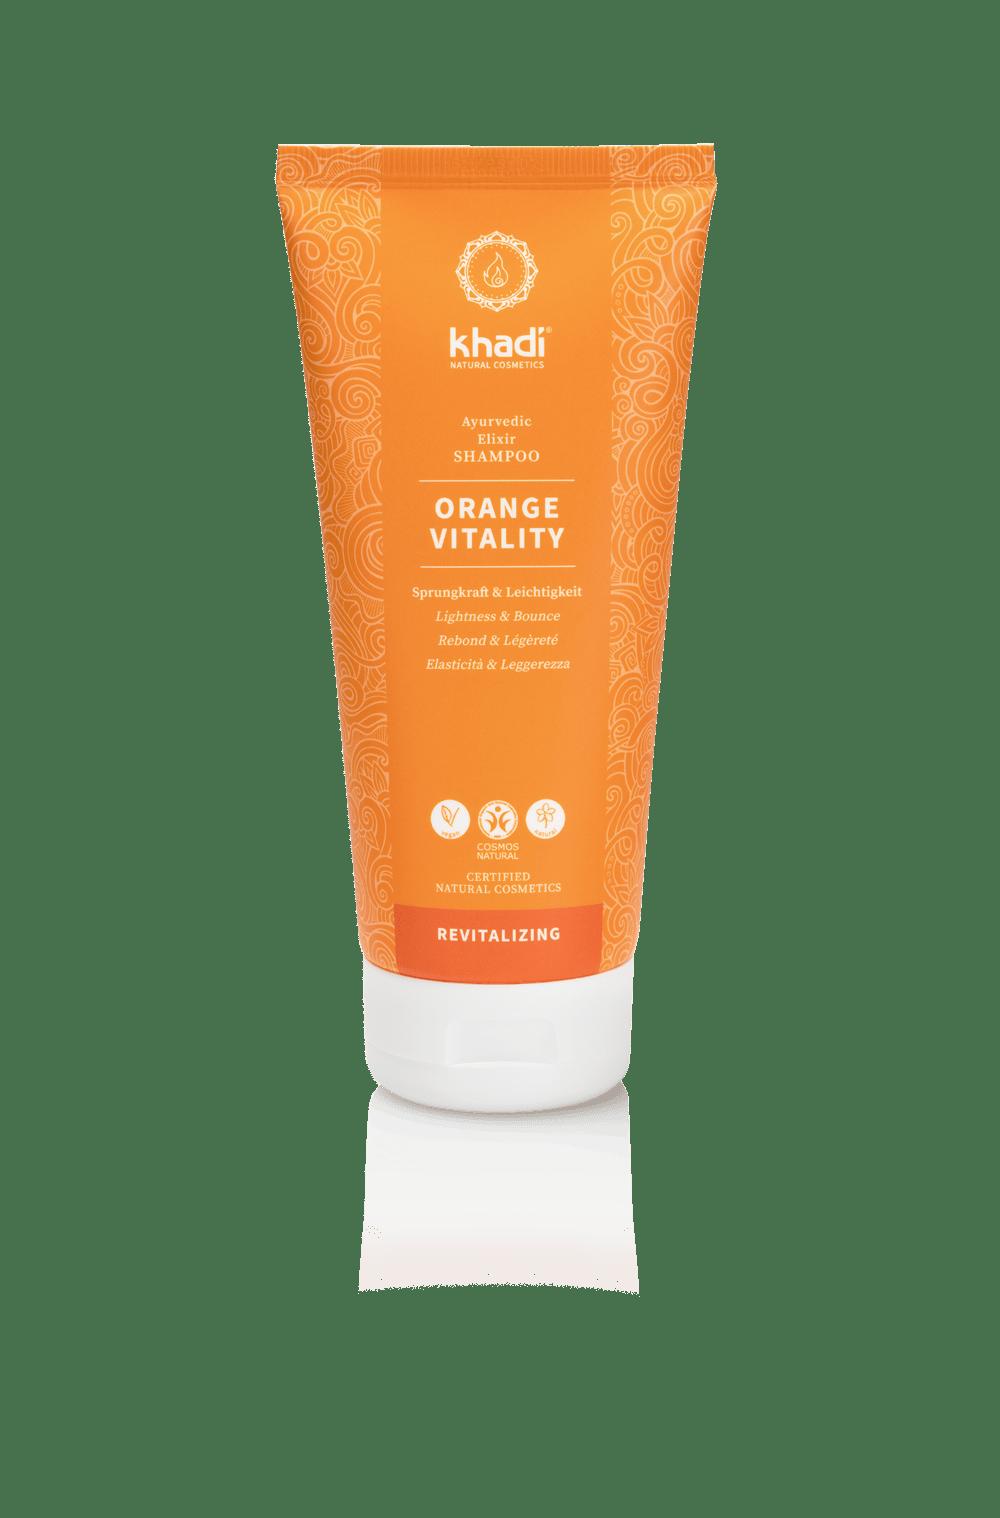 Shampoo Orange Vitality